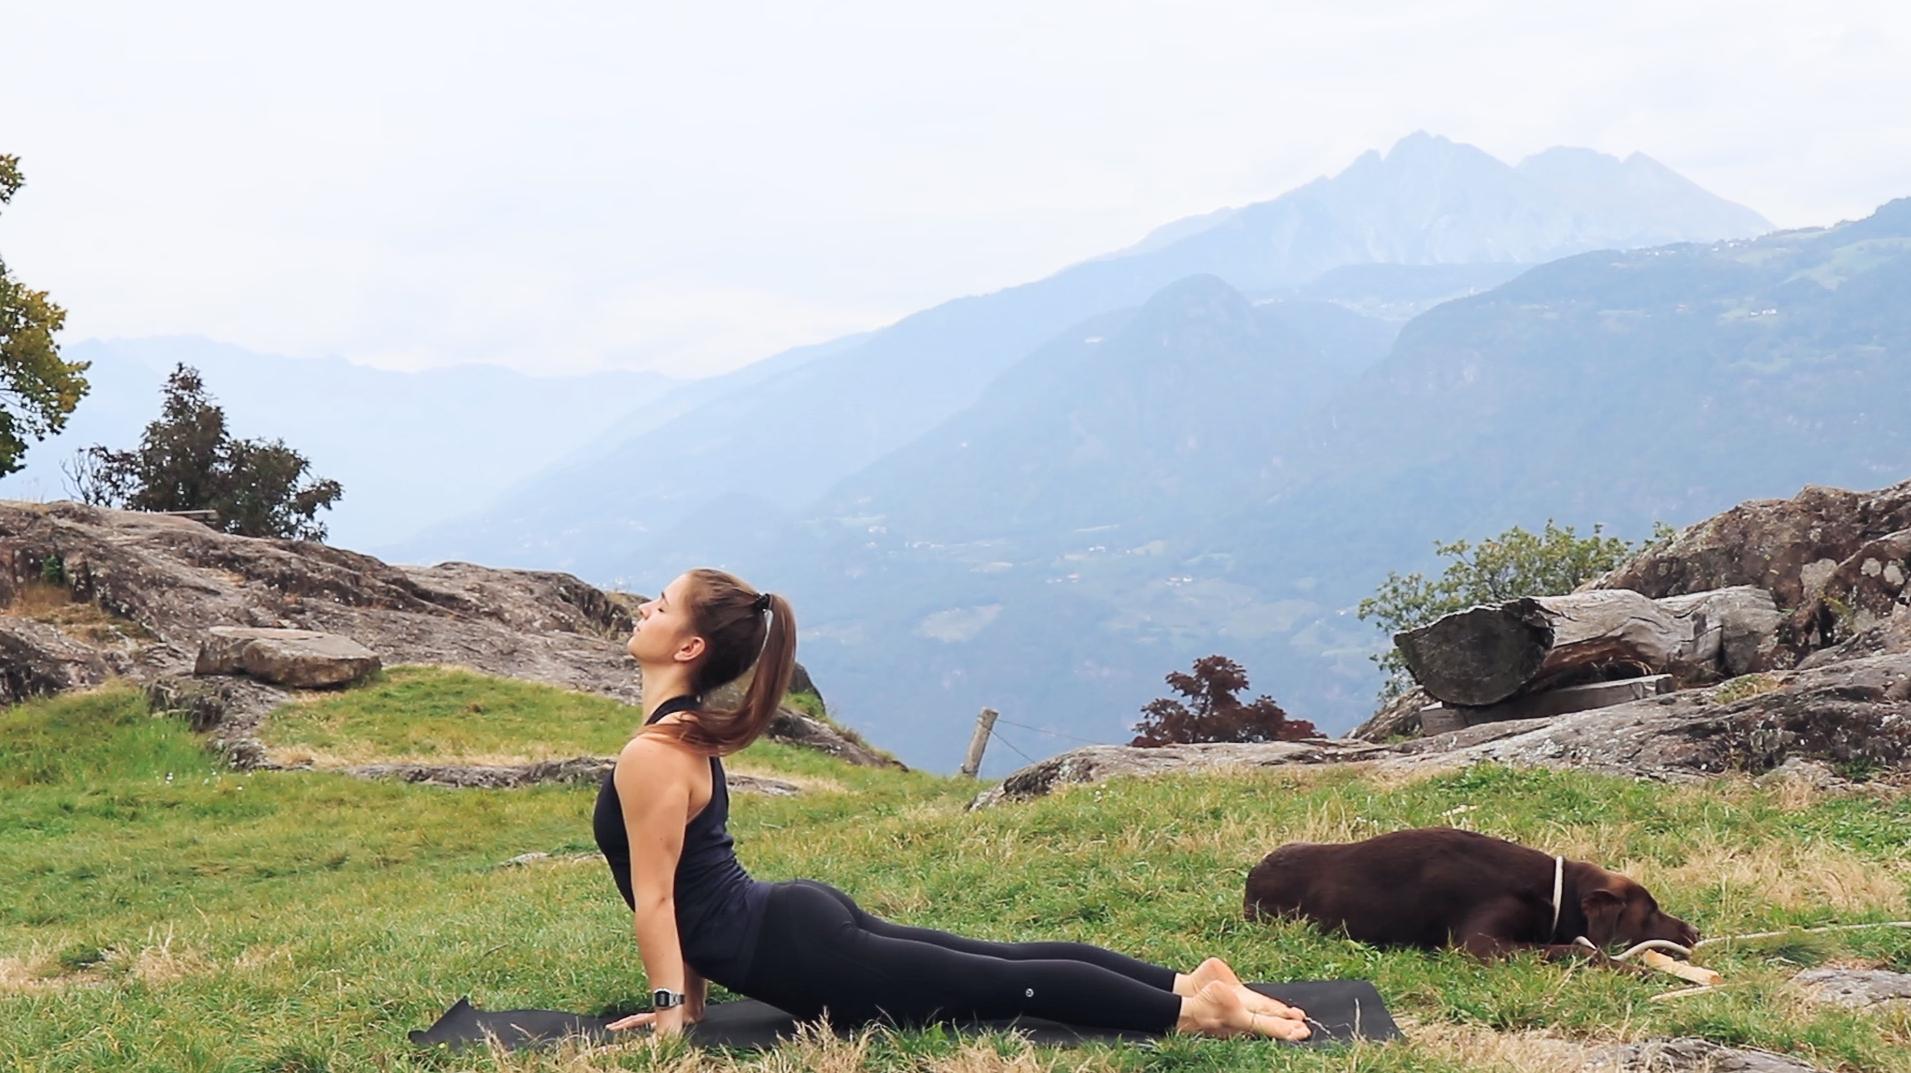 Mady-Morrison-Yoga-Mountain-Flow-Kraft-Staerke-00012